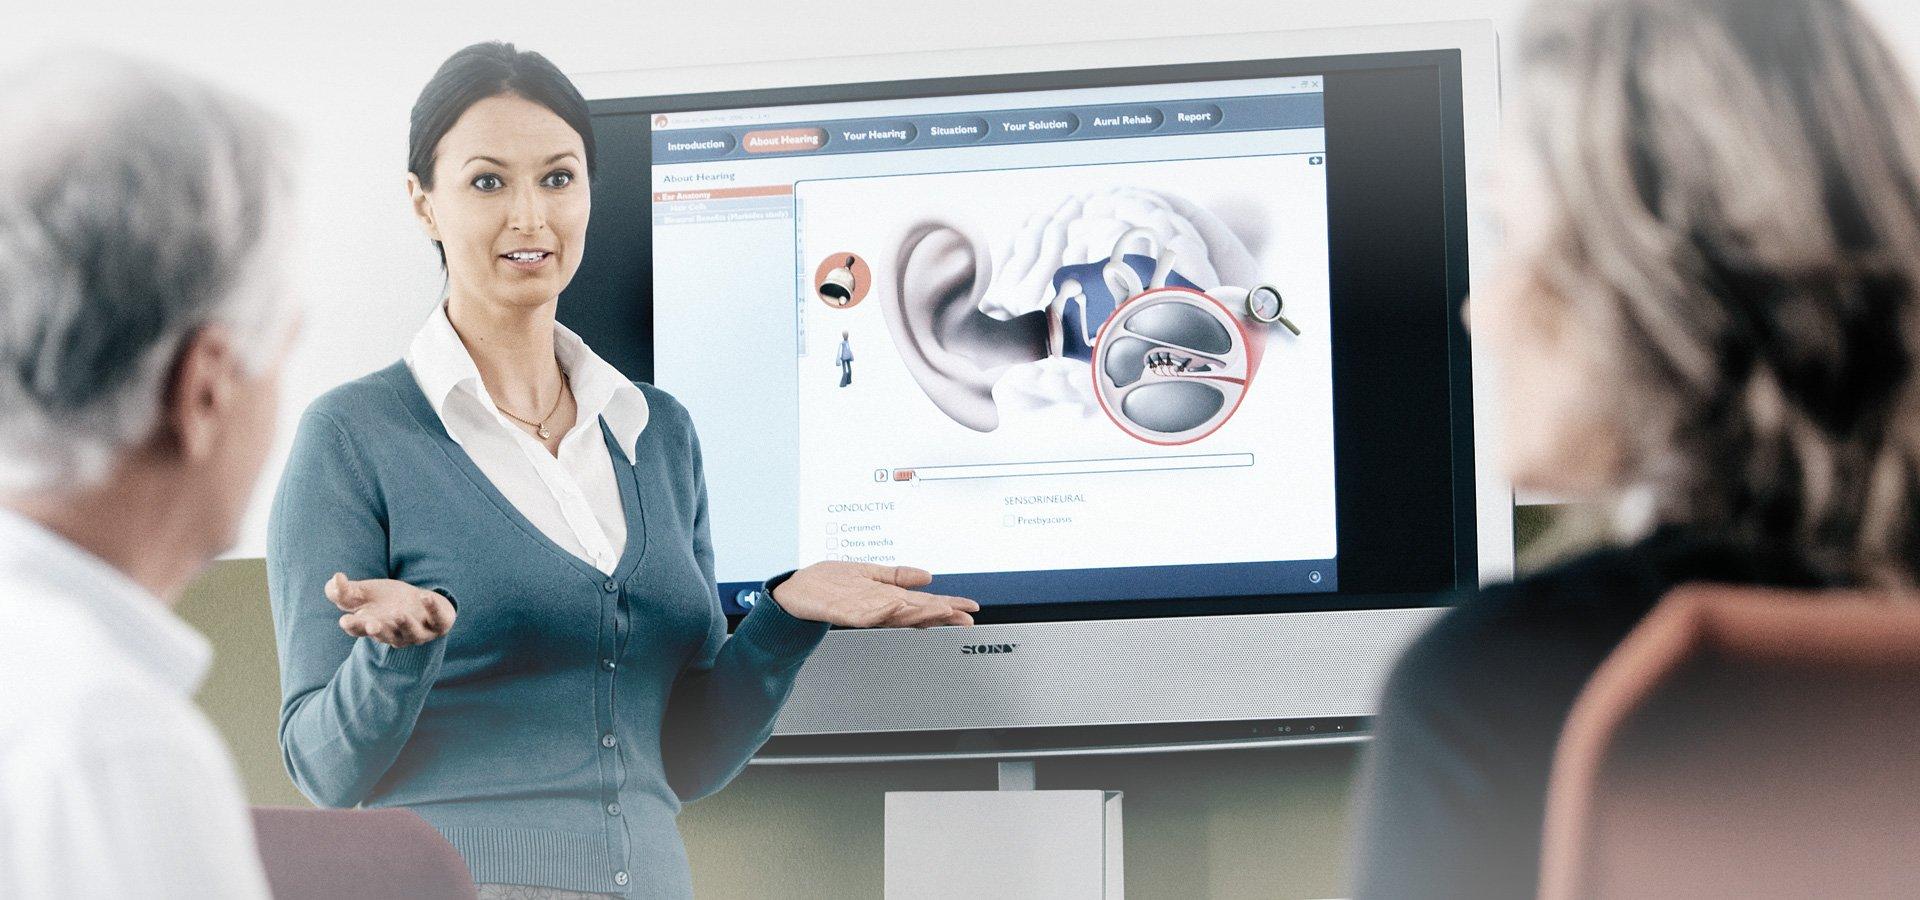 introbanner-hearing-loss-1920x900